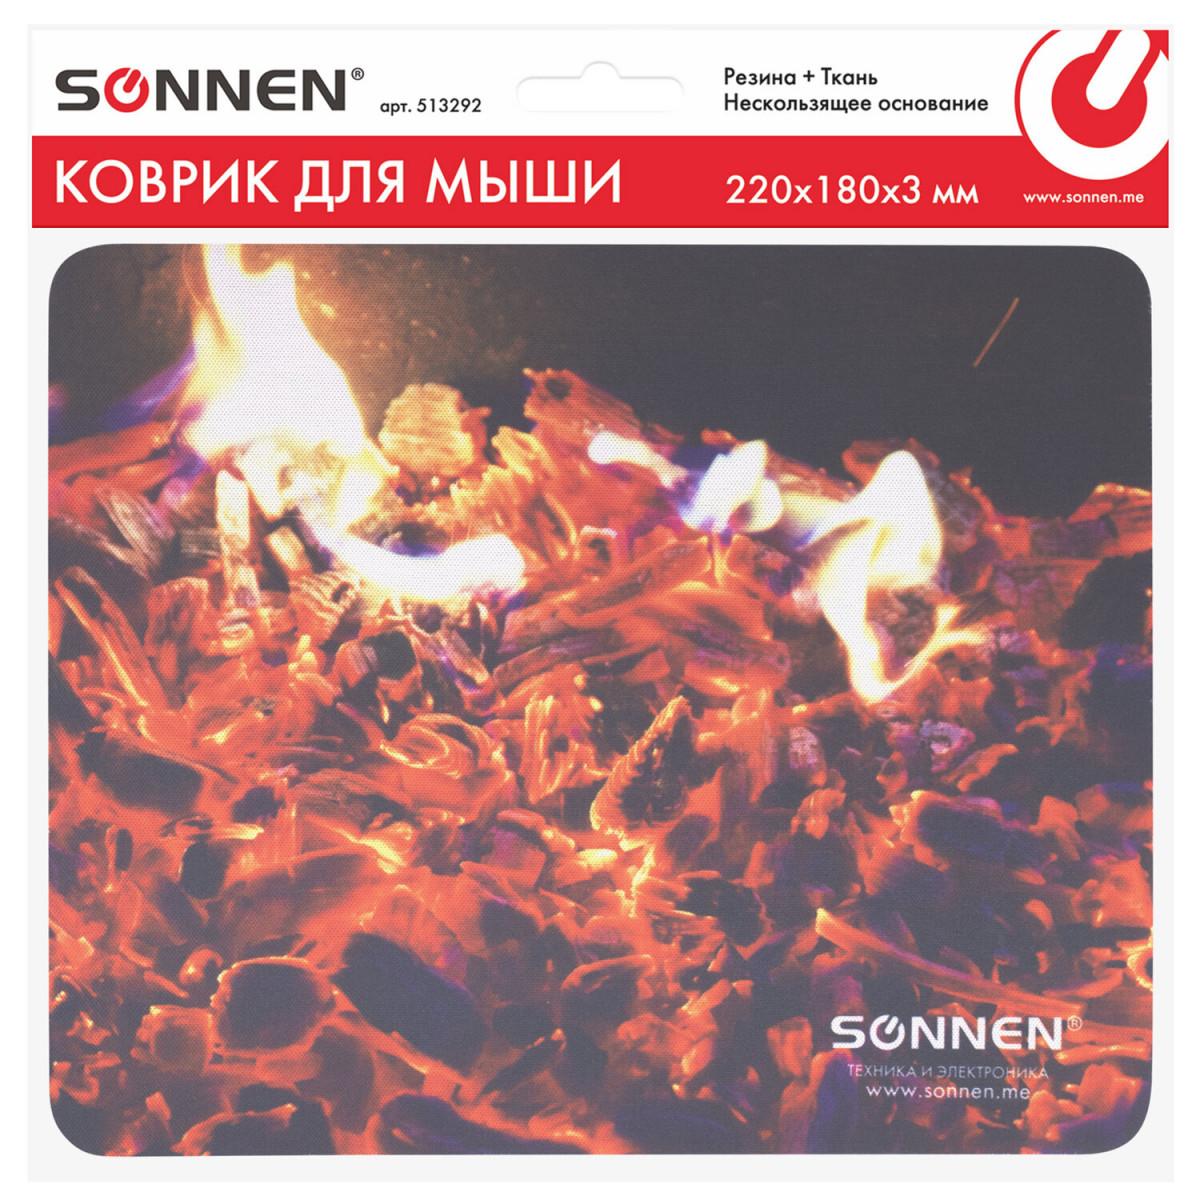 "Коврик для мыши SONNEN ""FIRE"", резина + ткань, 220х180х3 мм, 513292 (арт. 513292)"